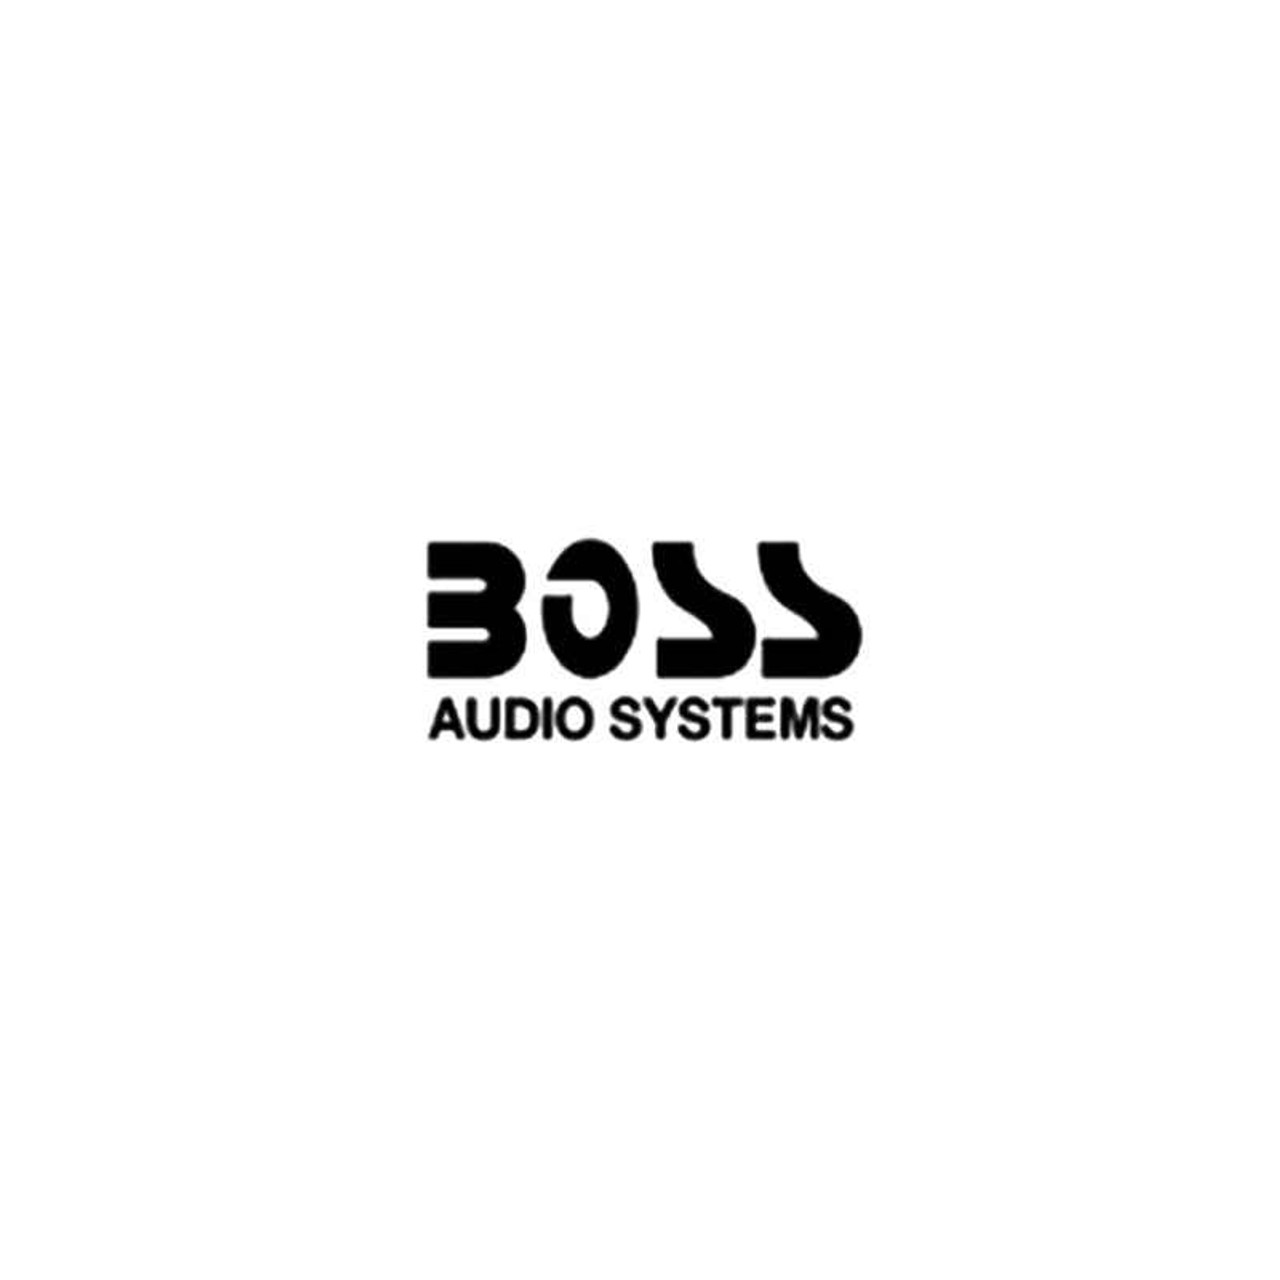 "2x Boss Audio Systems Decal Stickers 3.0/"" x 0.95/"" Metallic gold chrome logo pro"